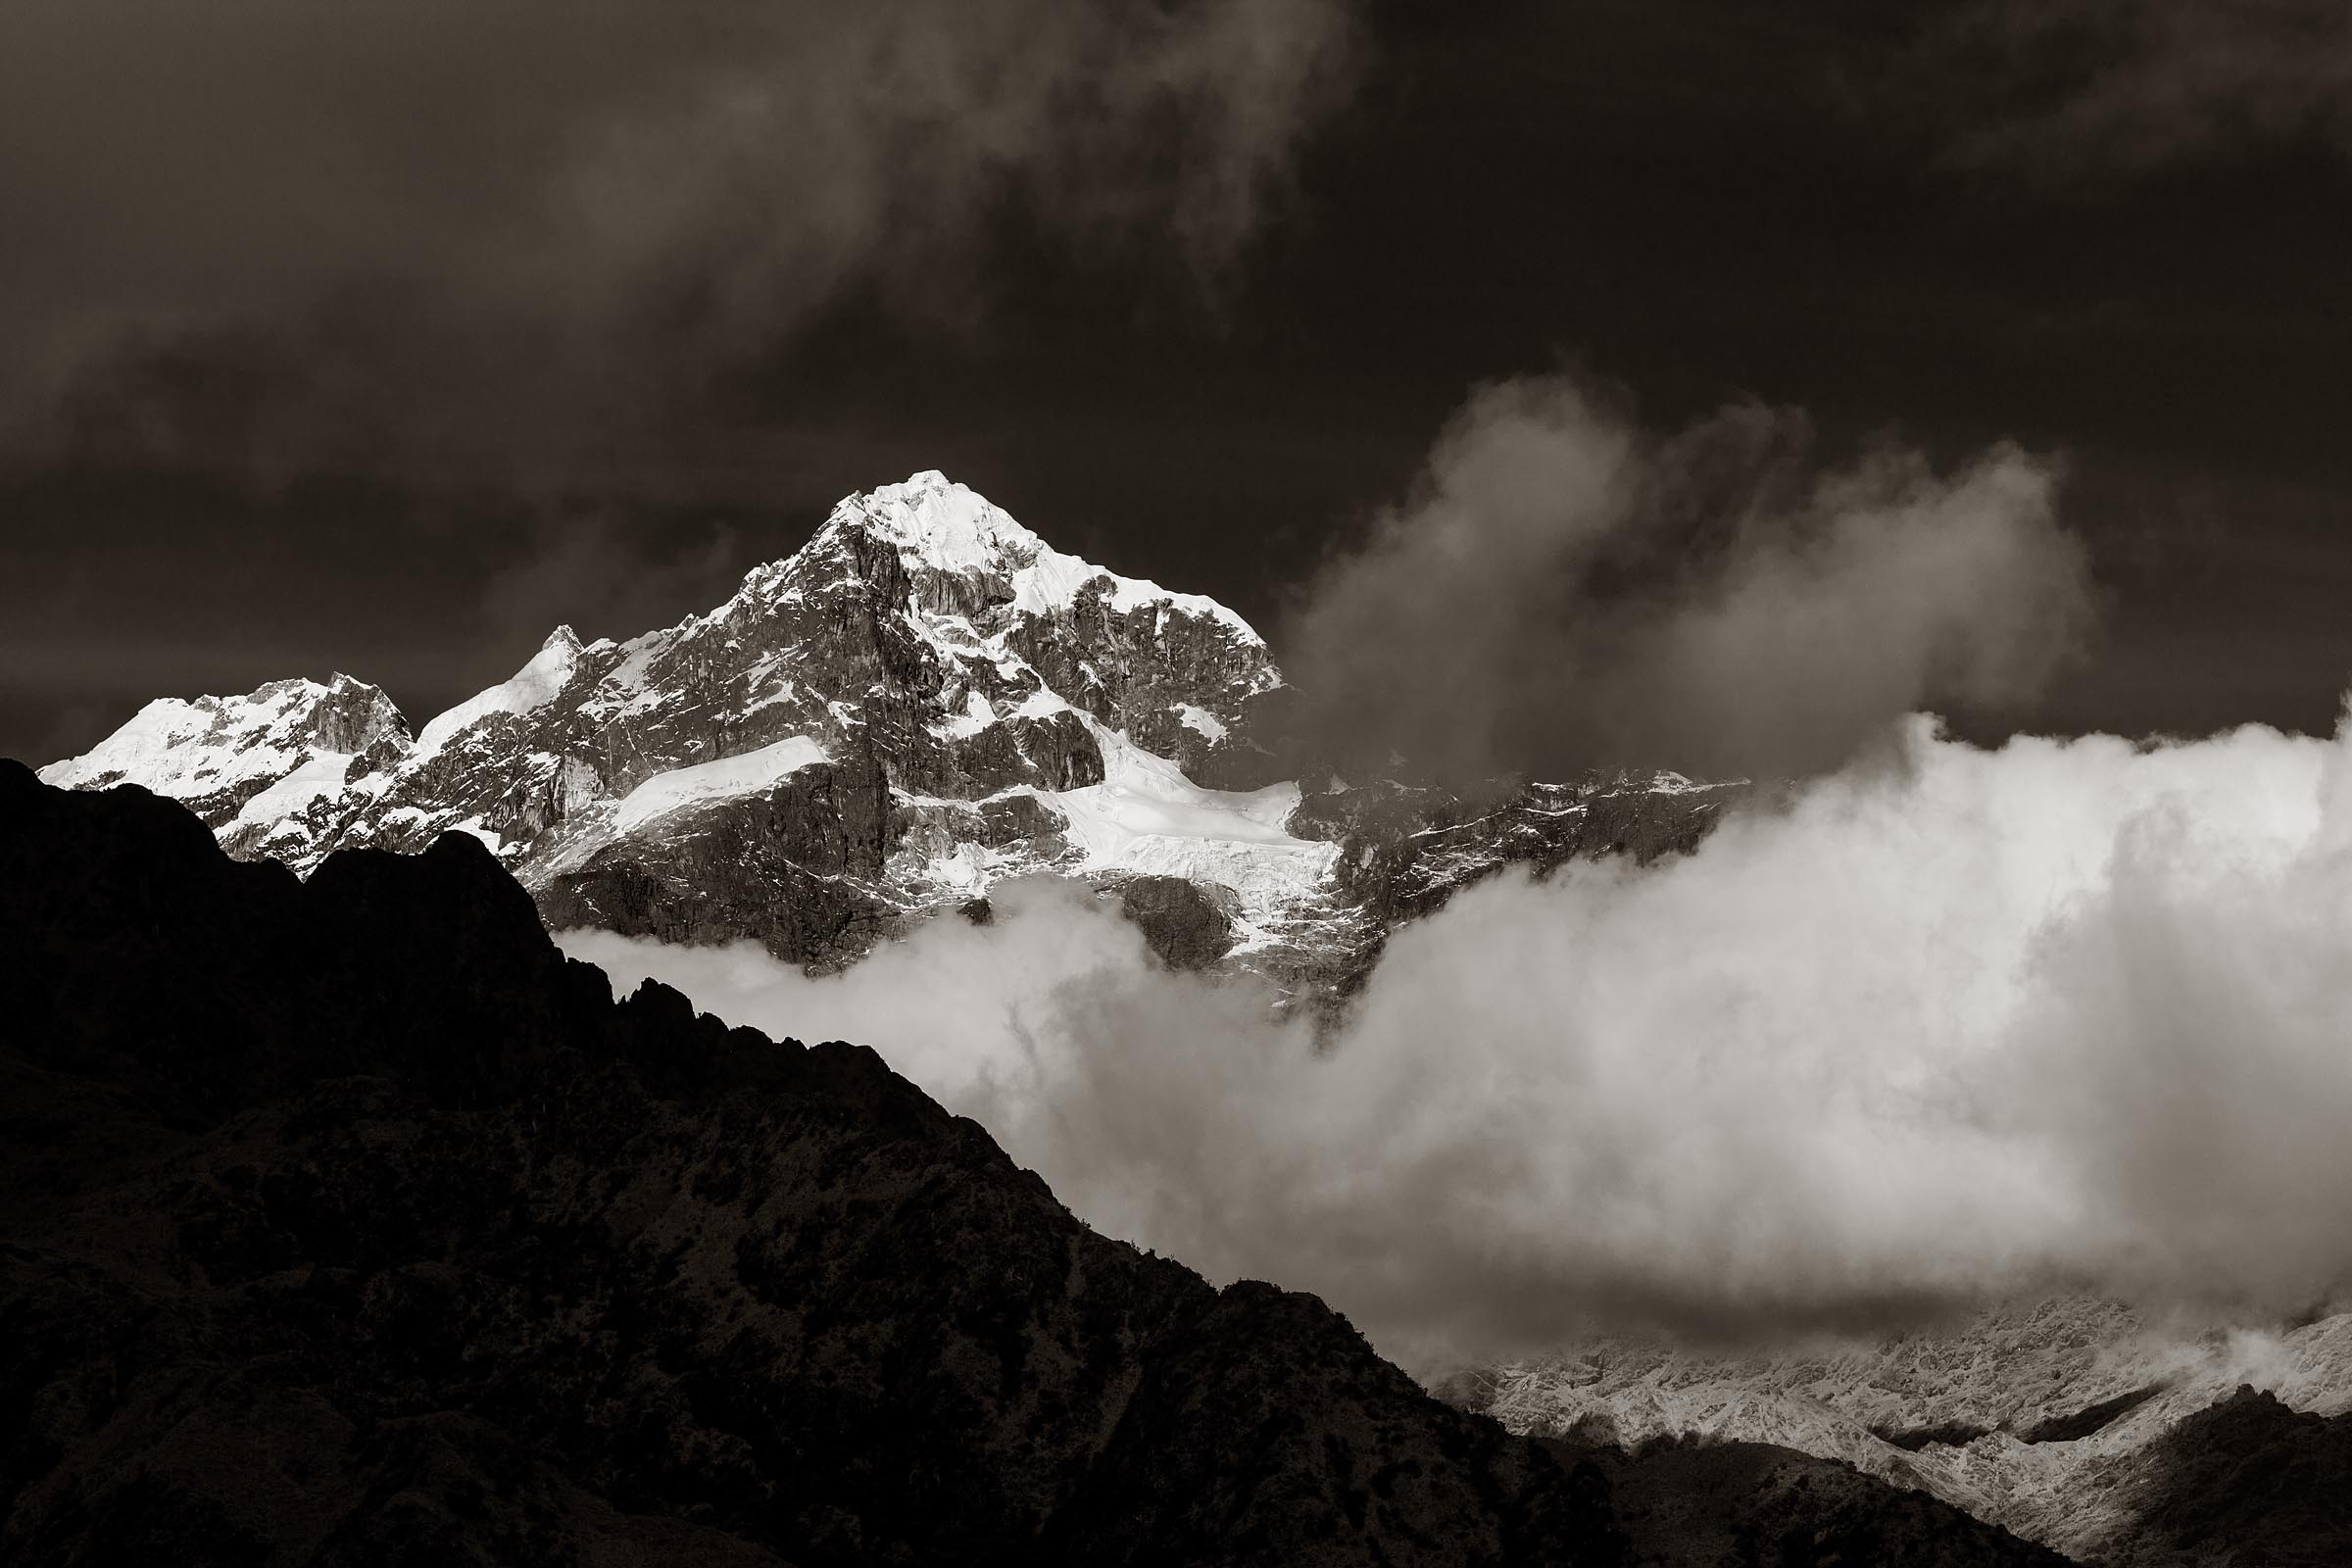 Spetactular views along the Inca Trail.